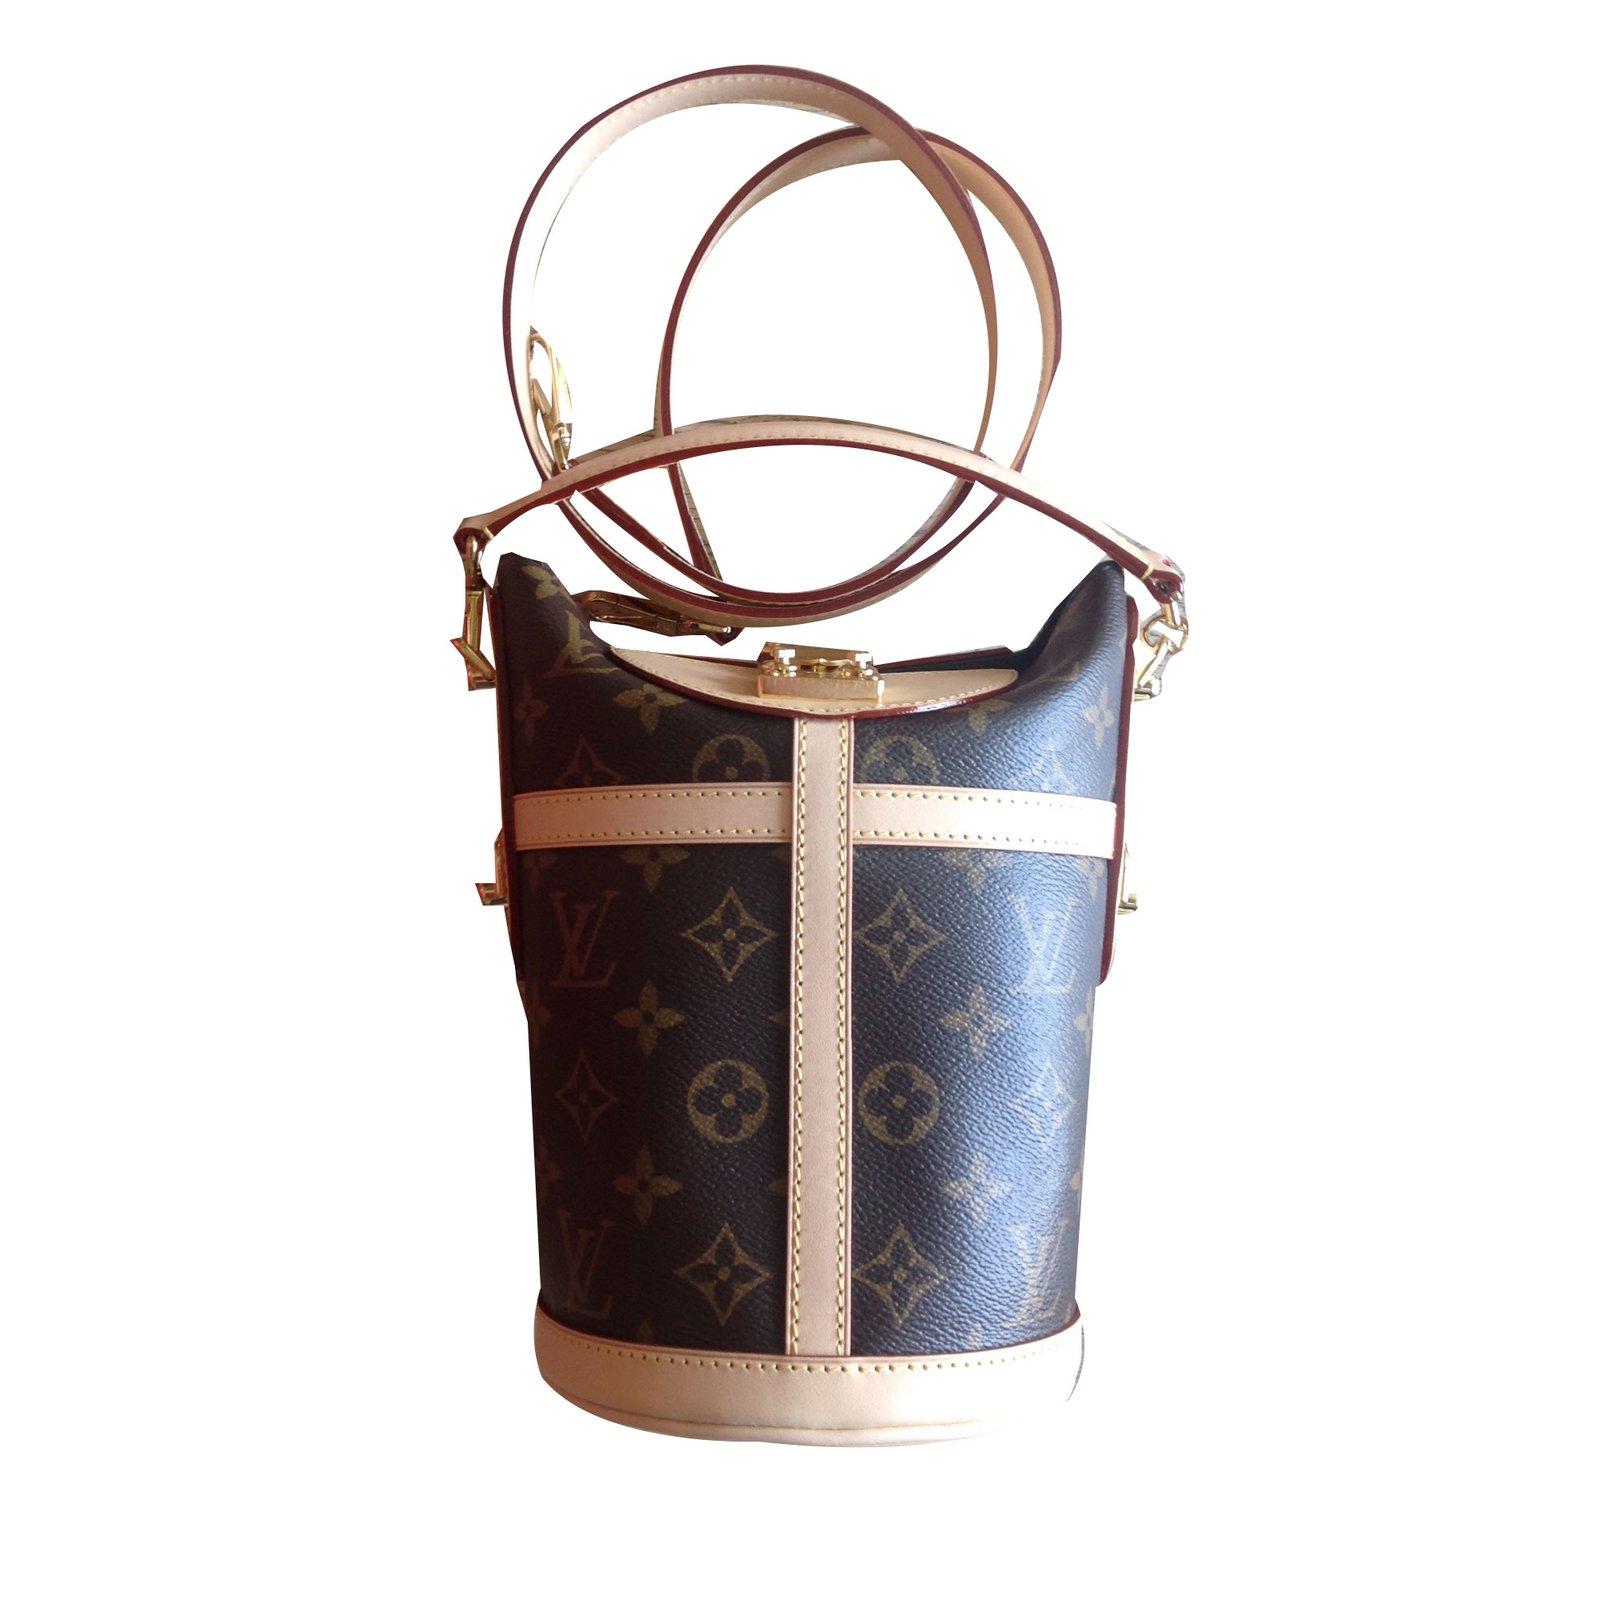 83deac2b31c9 Louis Vuitton Duffle Handbags Leather Brown ref.72291 - Joli Closet